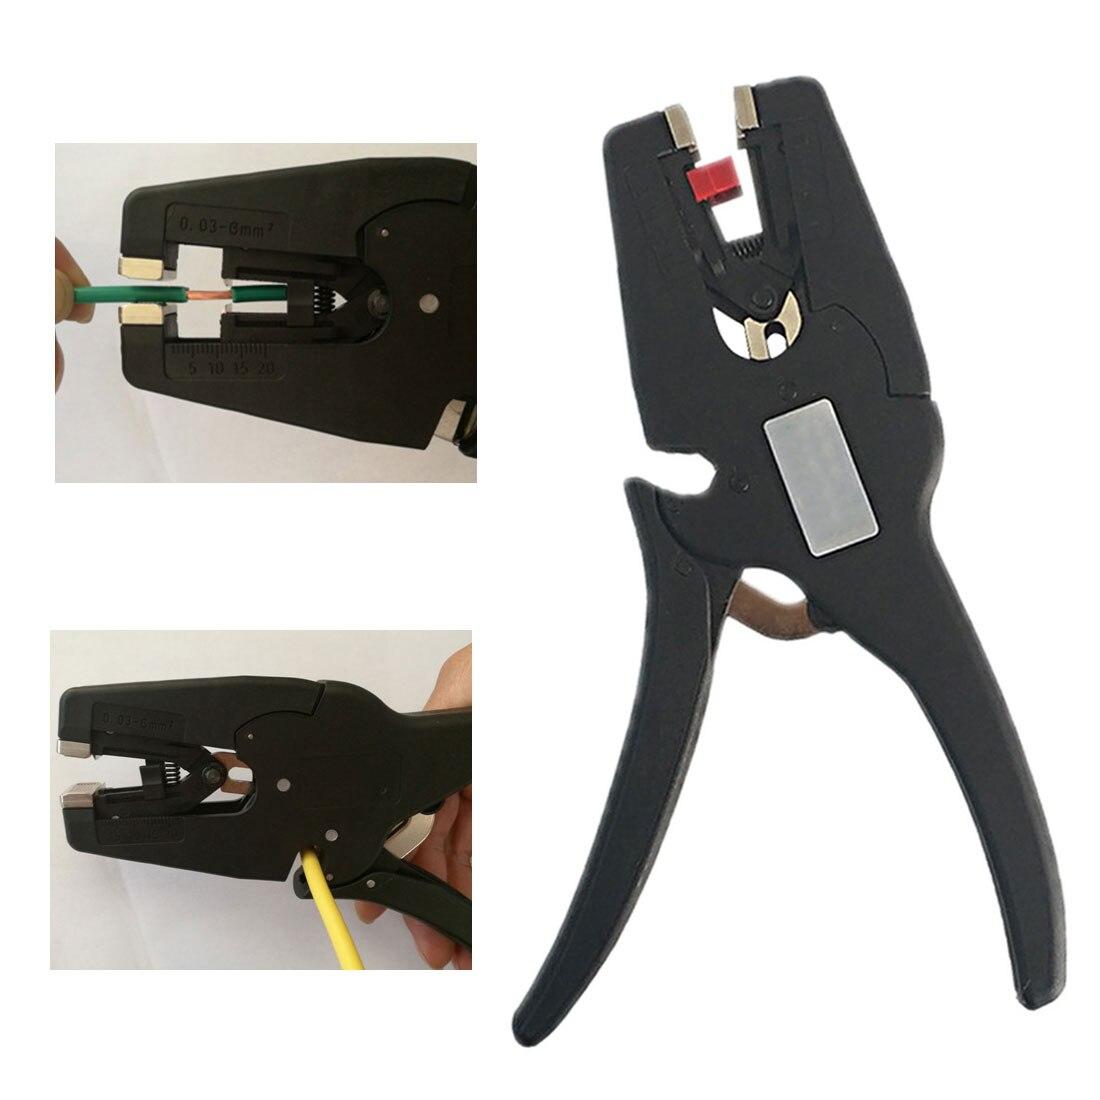 Wire Stripper Self-Adjusting Range 0.03-10mm2 Stripping Cutter Flat Insulation Pliers